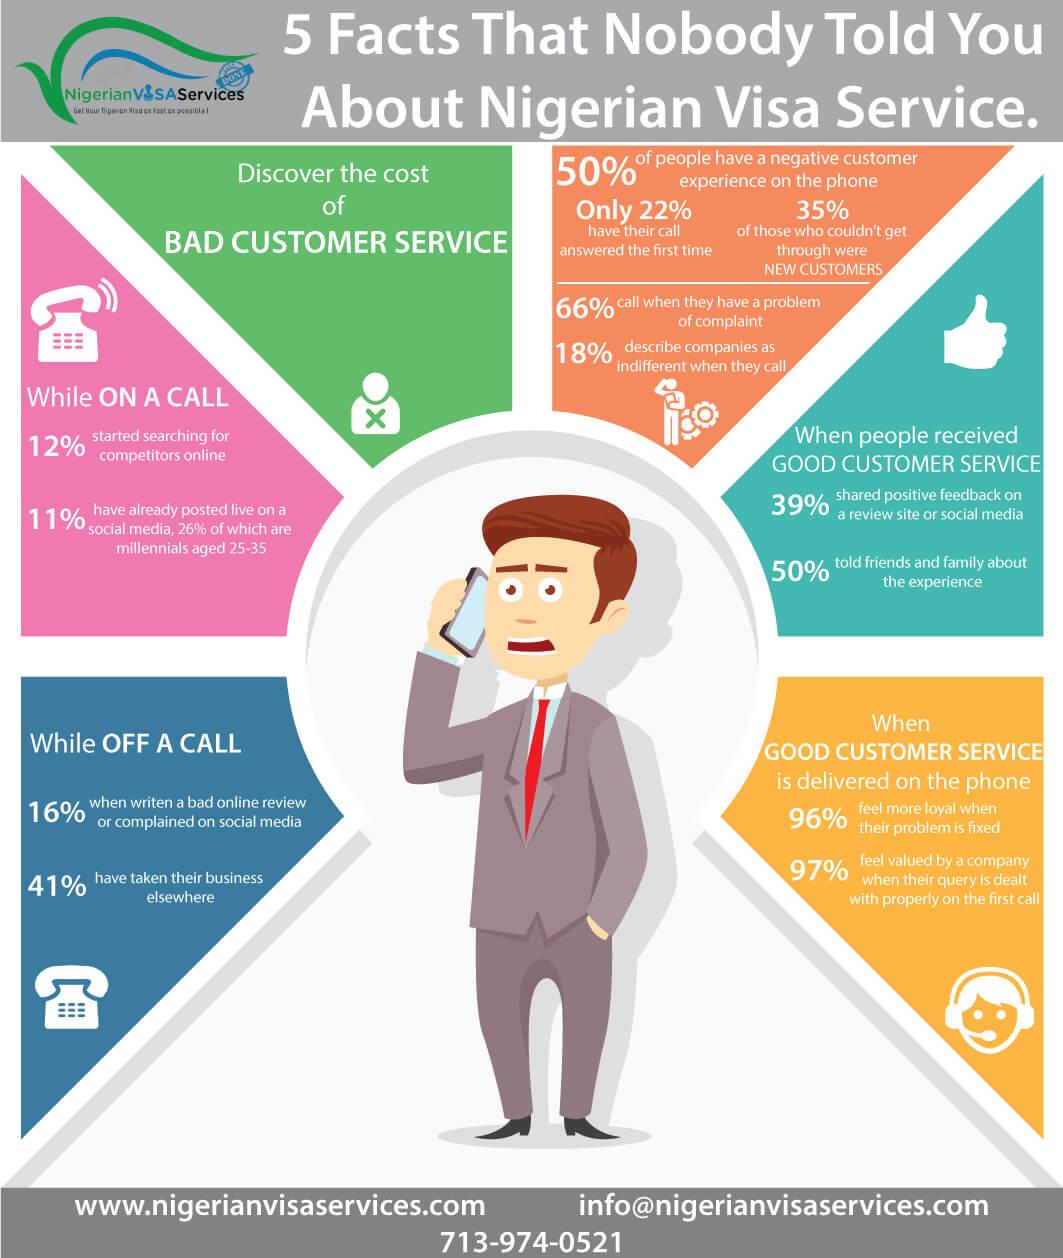 Nigerian Visa Service